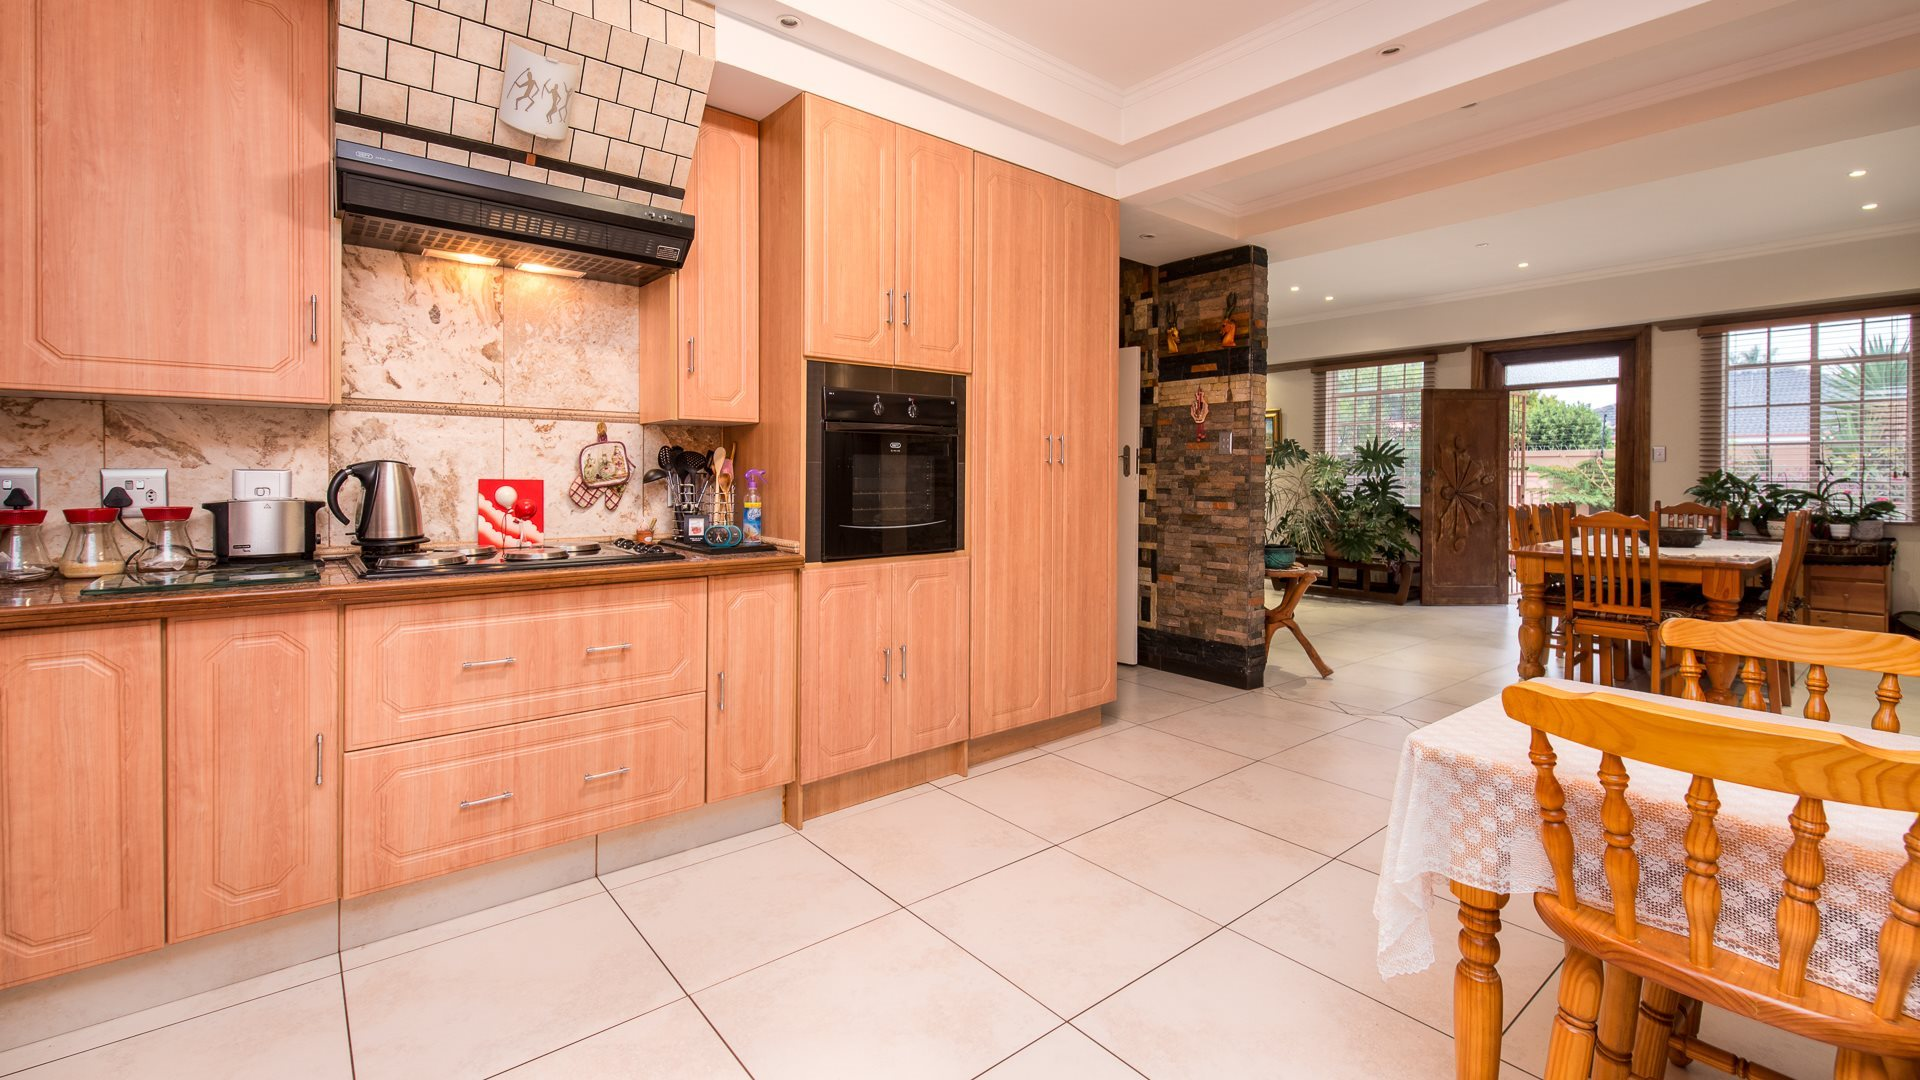 Johannesburg, Sydenham Property  | Houses For Sale Sydenham, Sydenham, House 3 bedrooms property for sale Price:1,500,000